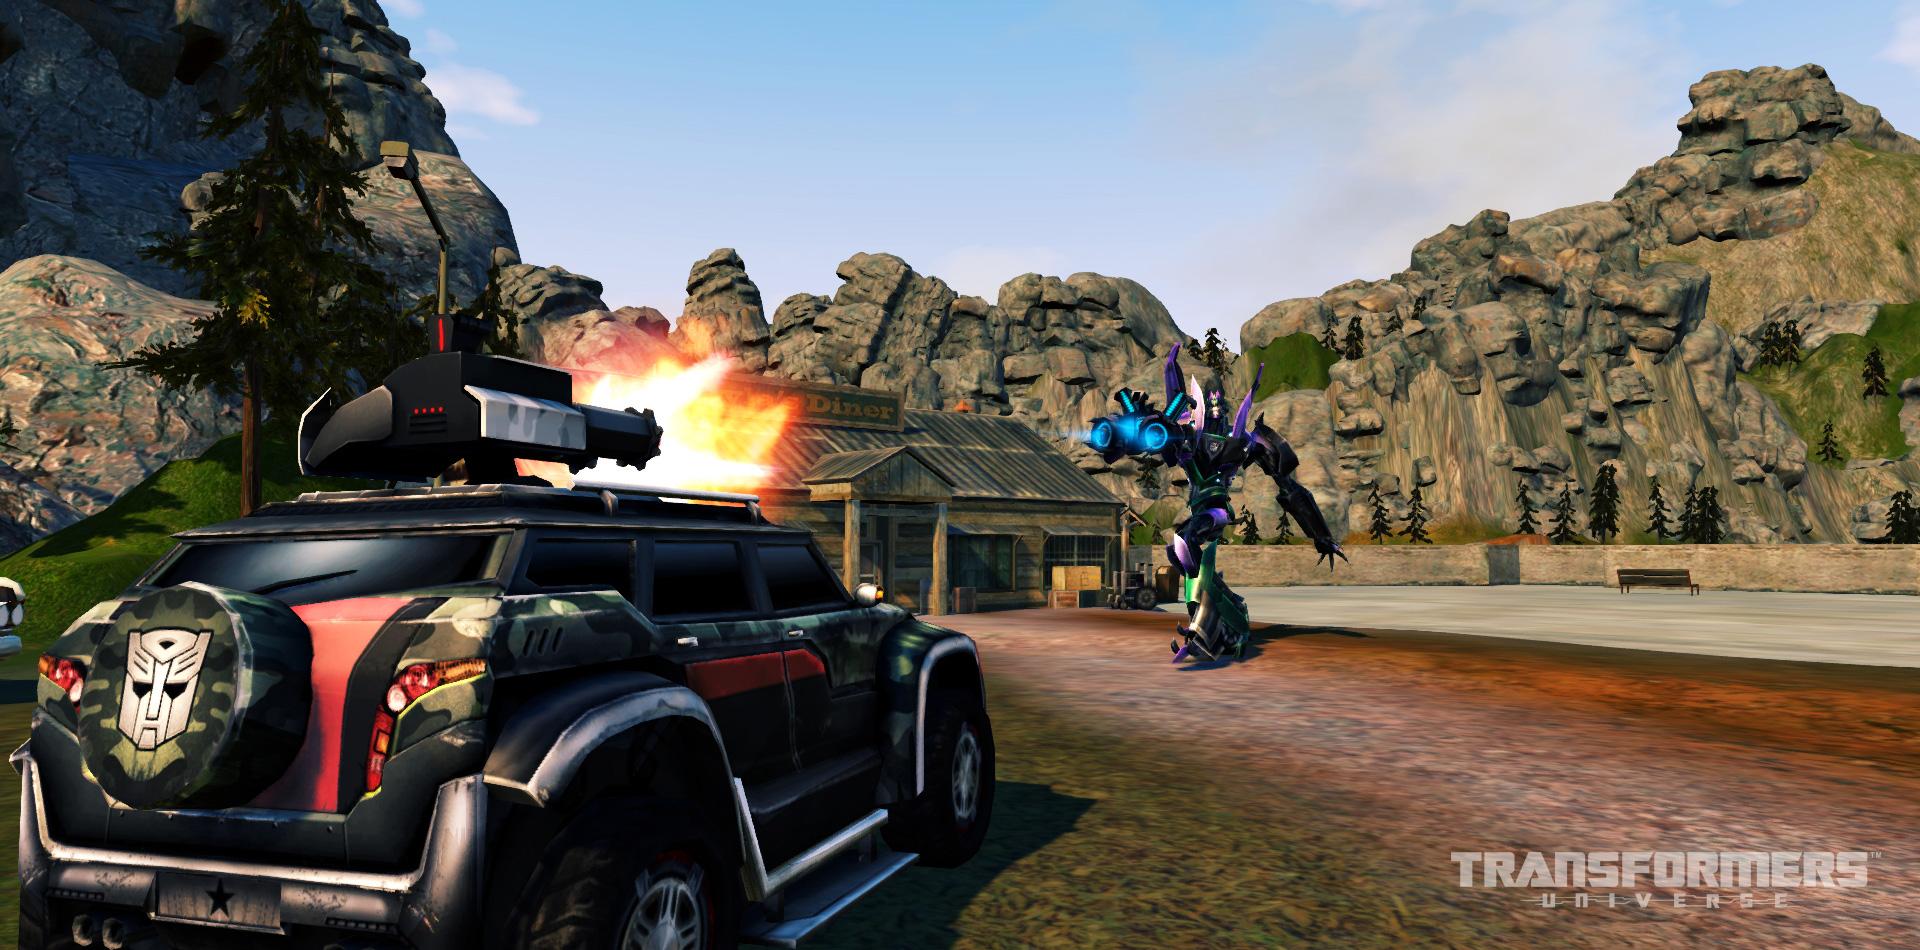 lh_transformers_universe_cb_deathmatch